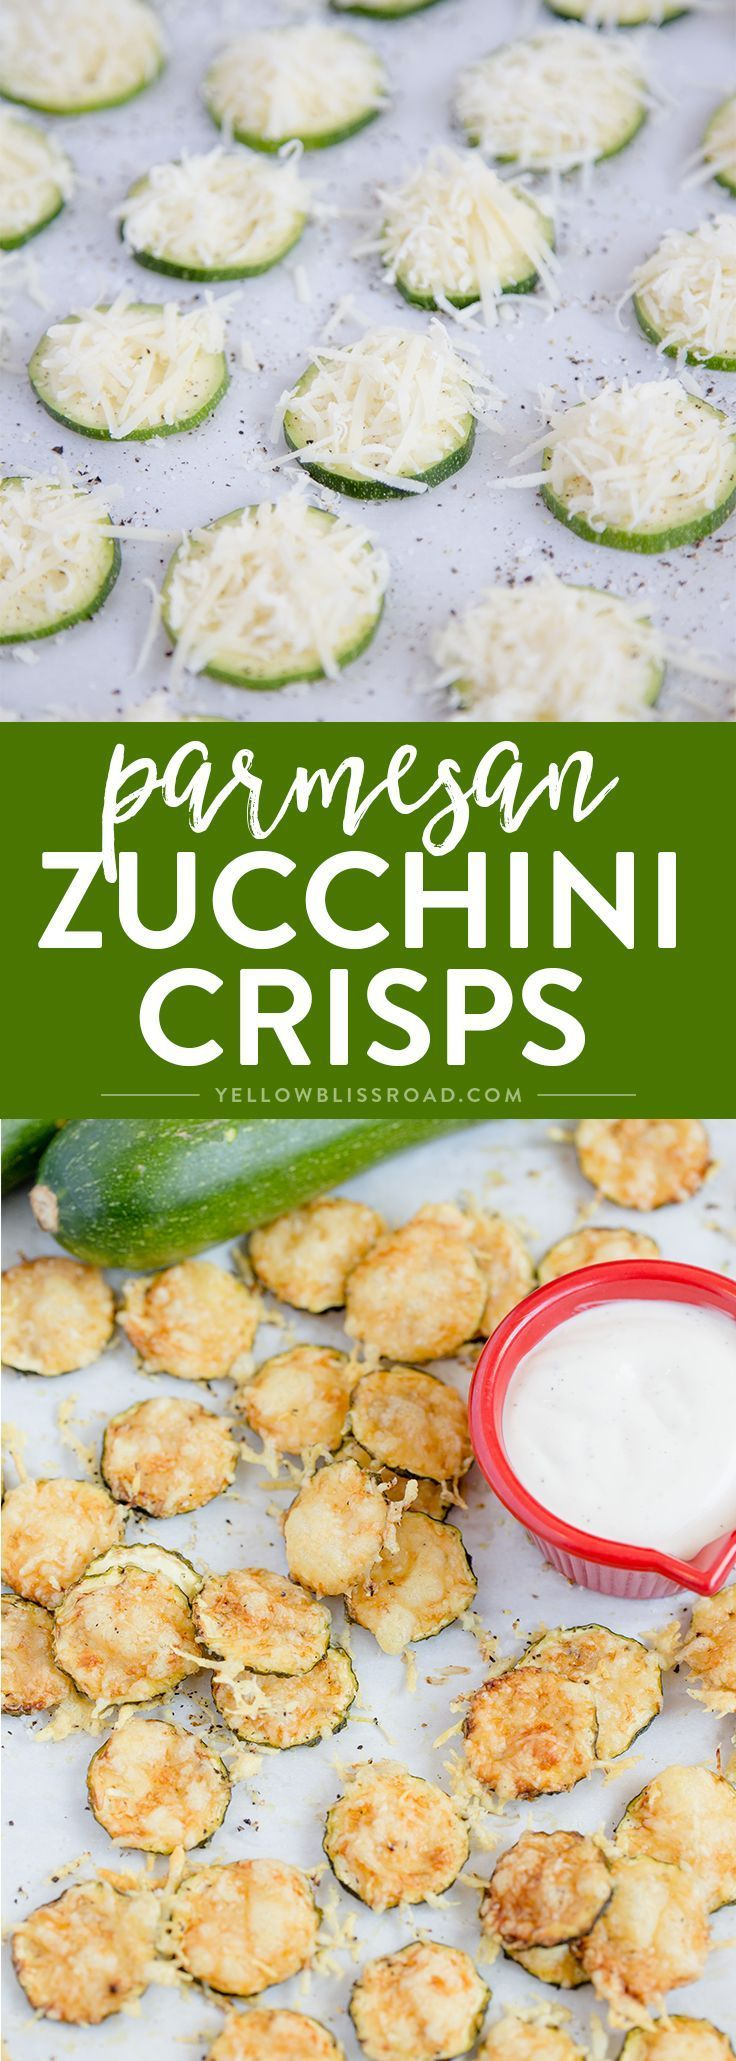 Baked Parmesan Zucchini Chips | YellowBlissRoad.com